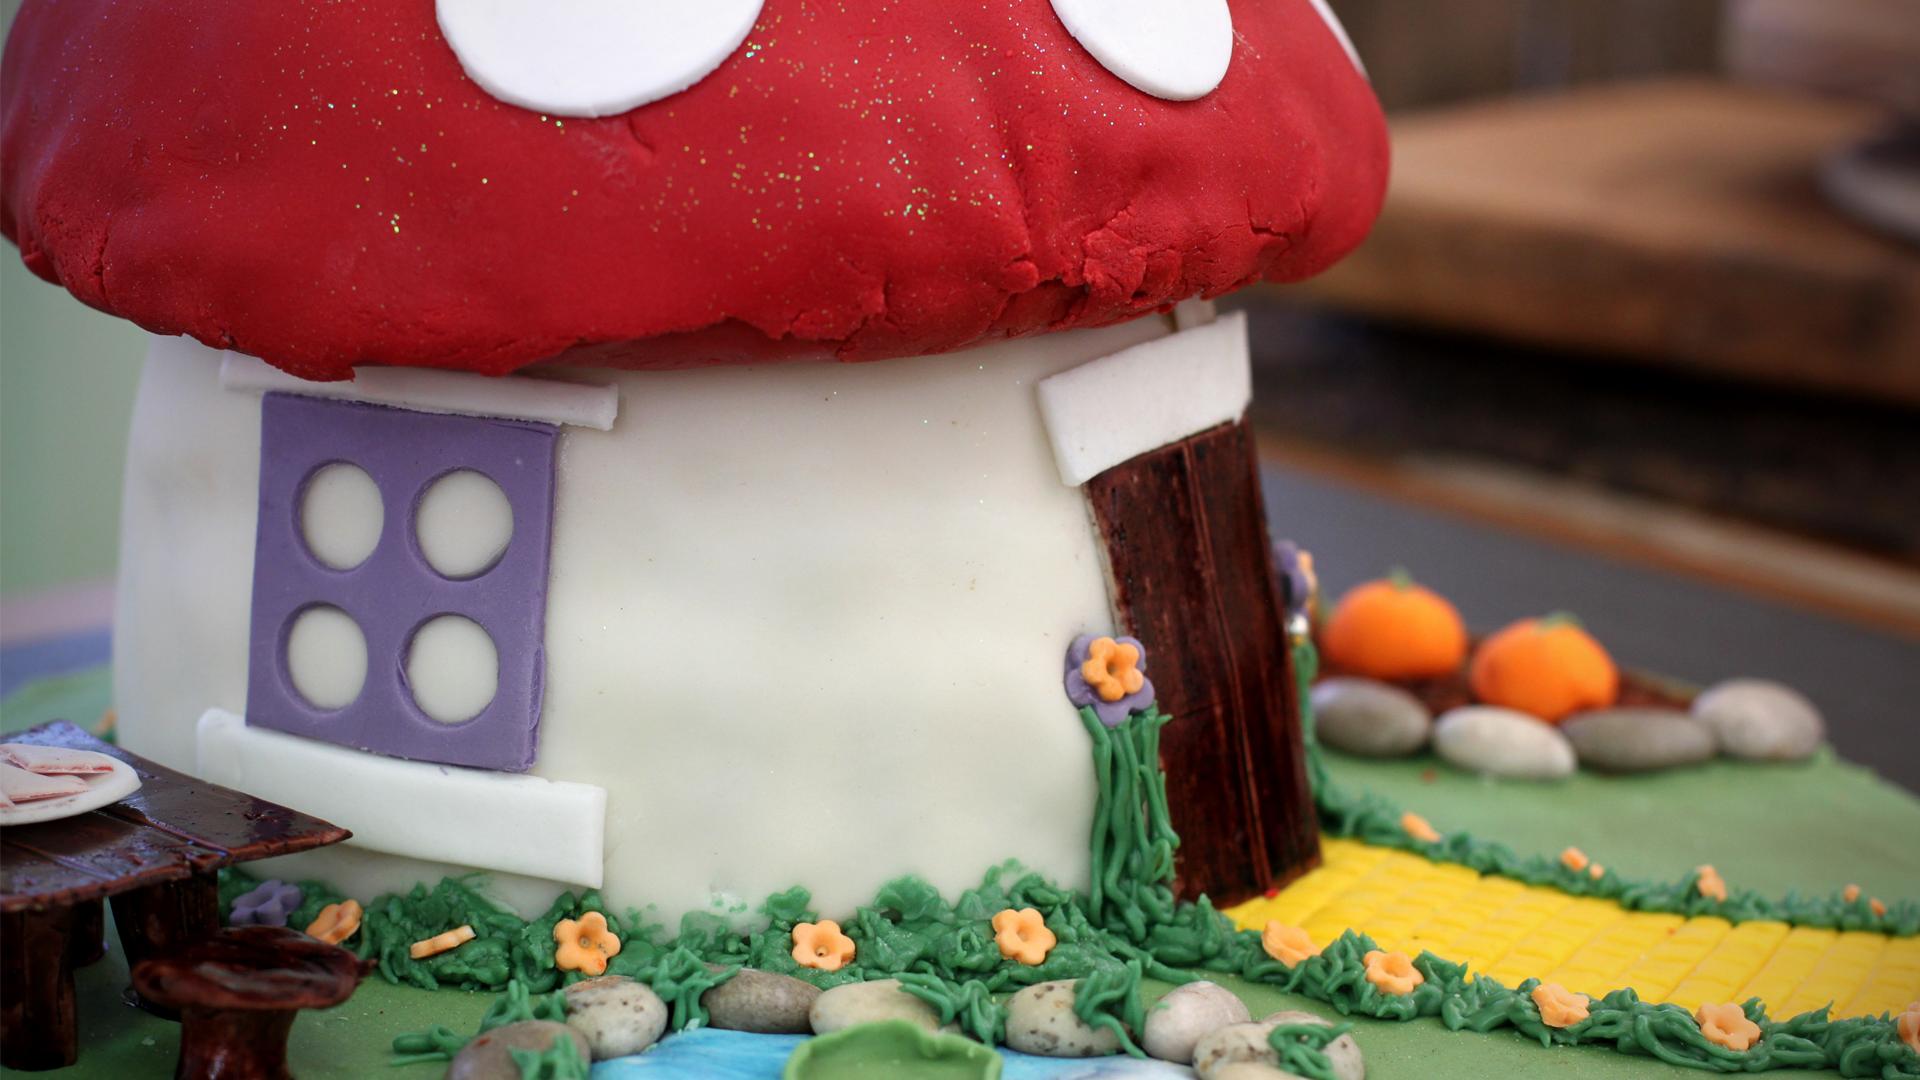 Toadstool-Cake